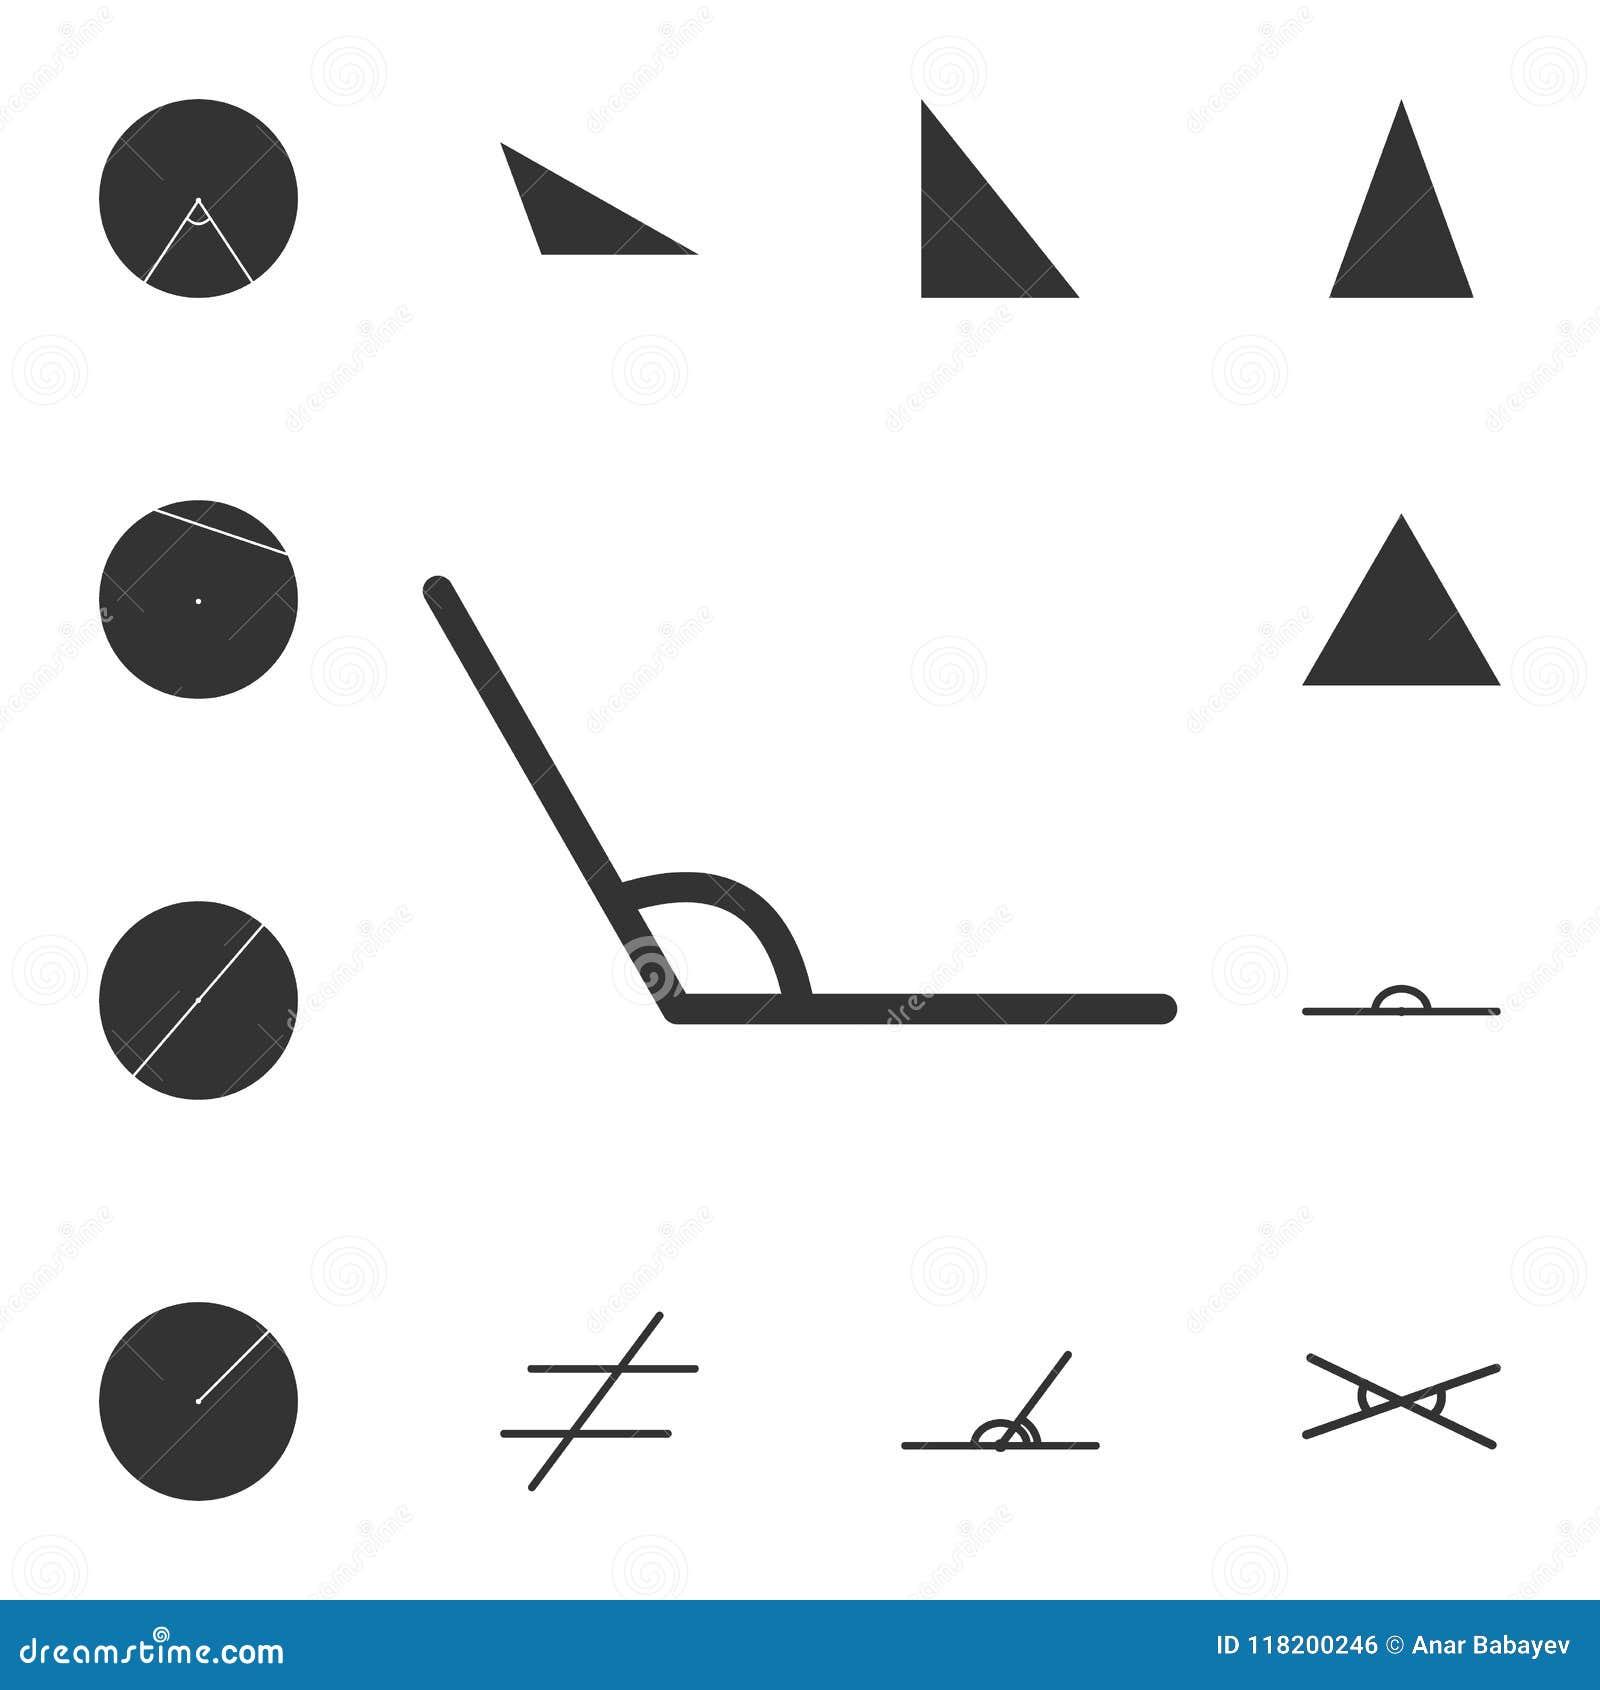 Obtuse Angle Icon Detailed Set Of Geometric Figure Premium Graphic